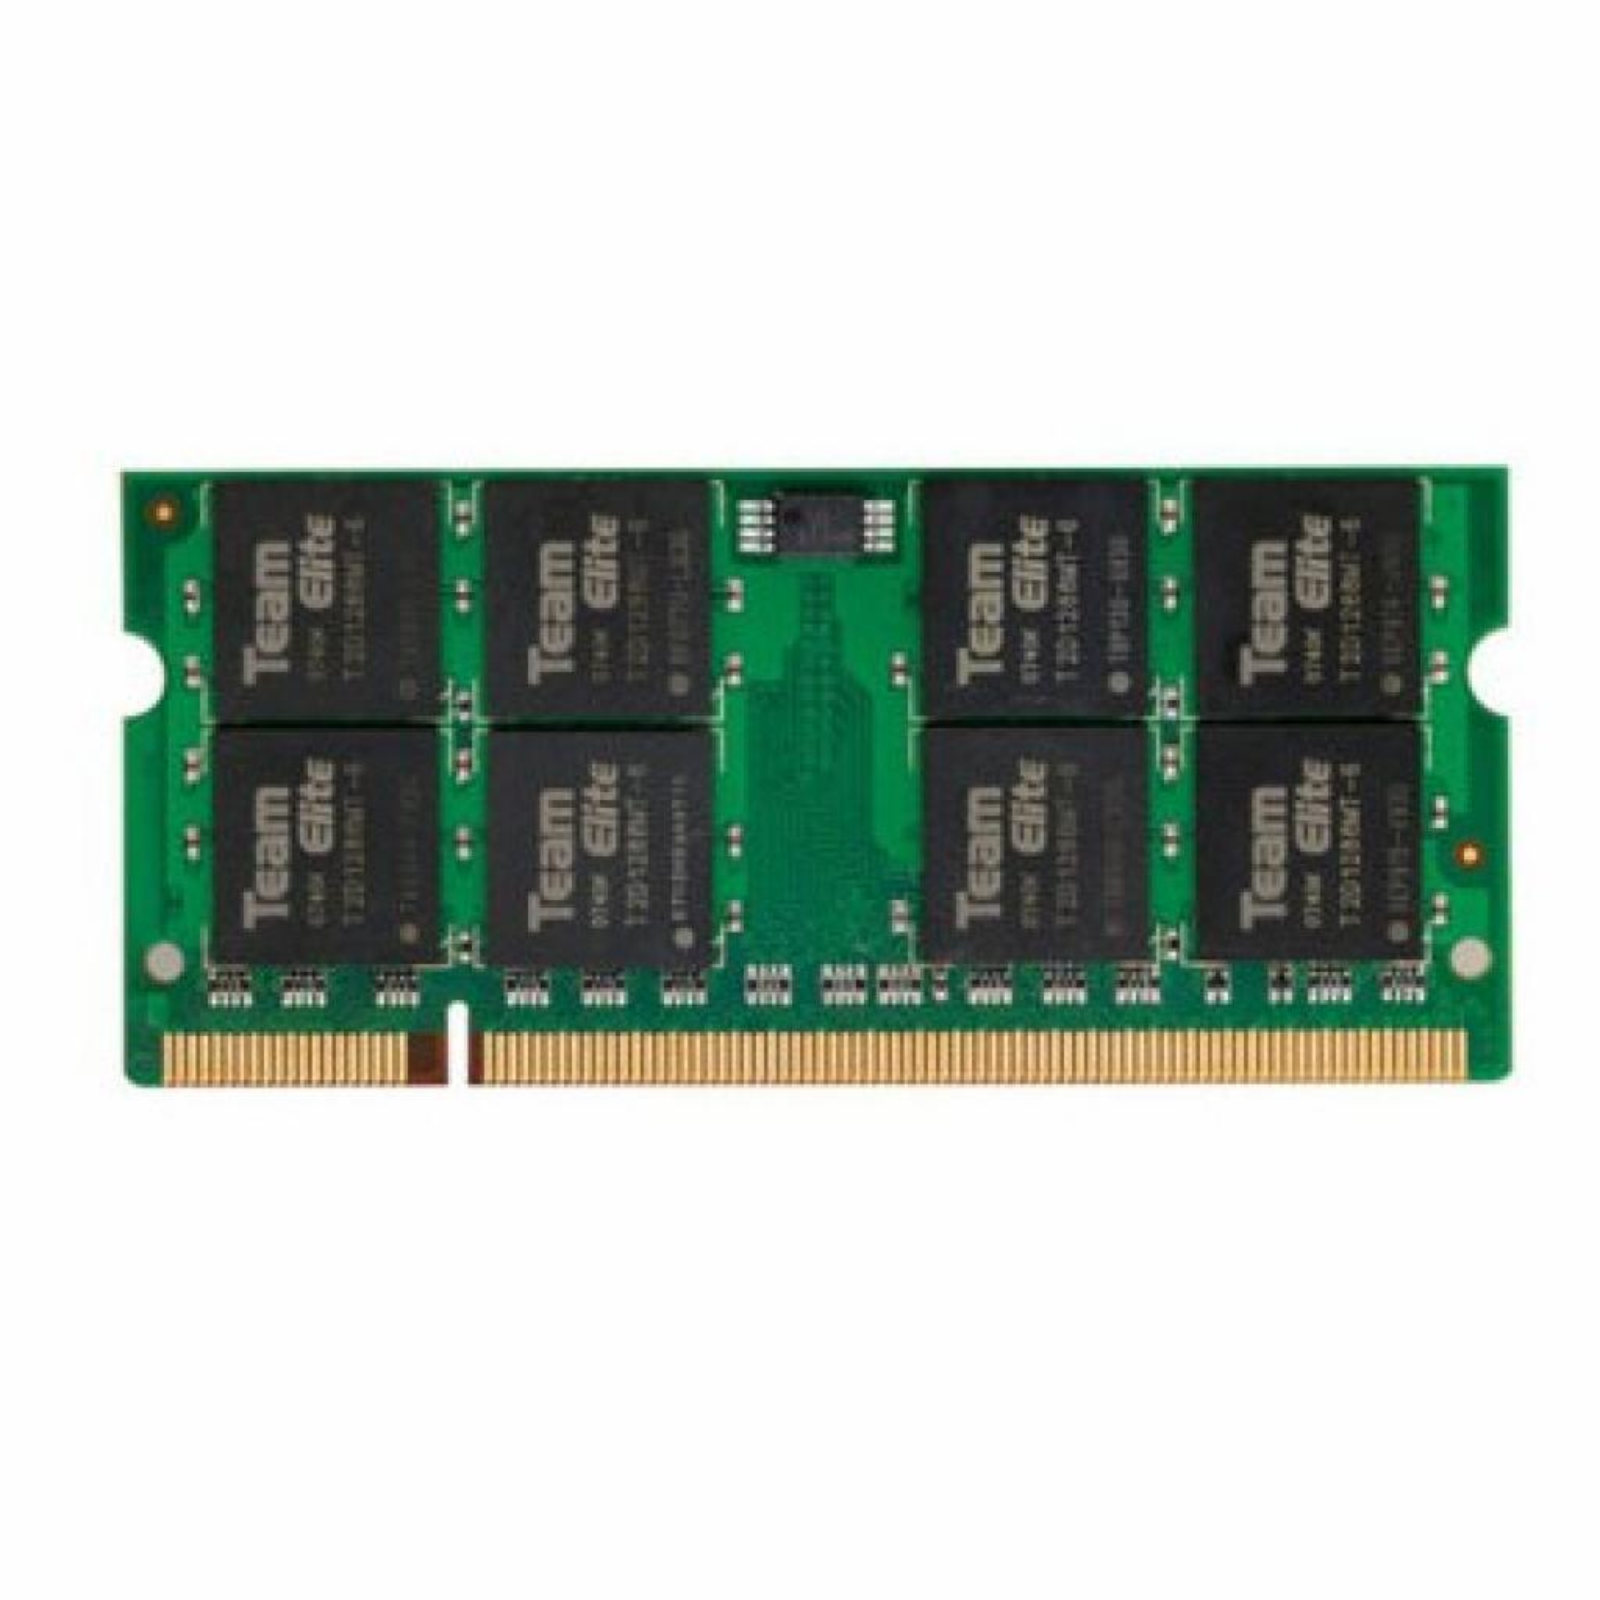 Модуль памяти для ноутбука SoDIMM DDR2 1GB 800 MHz Team (TED21G800C5-S01)